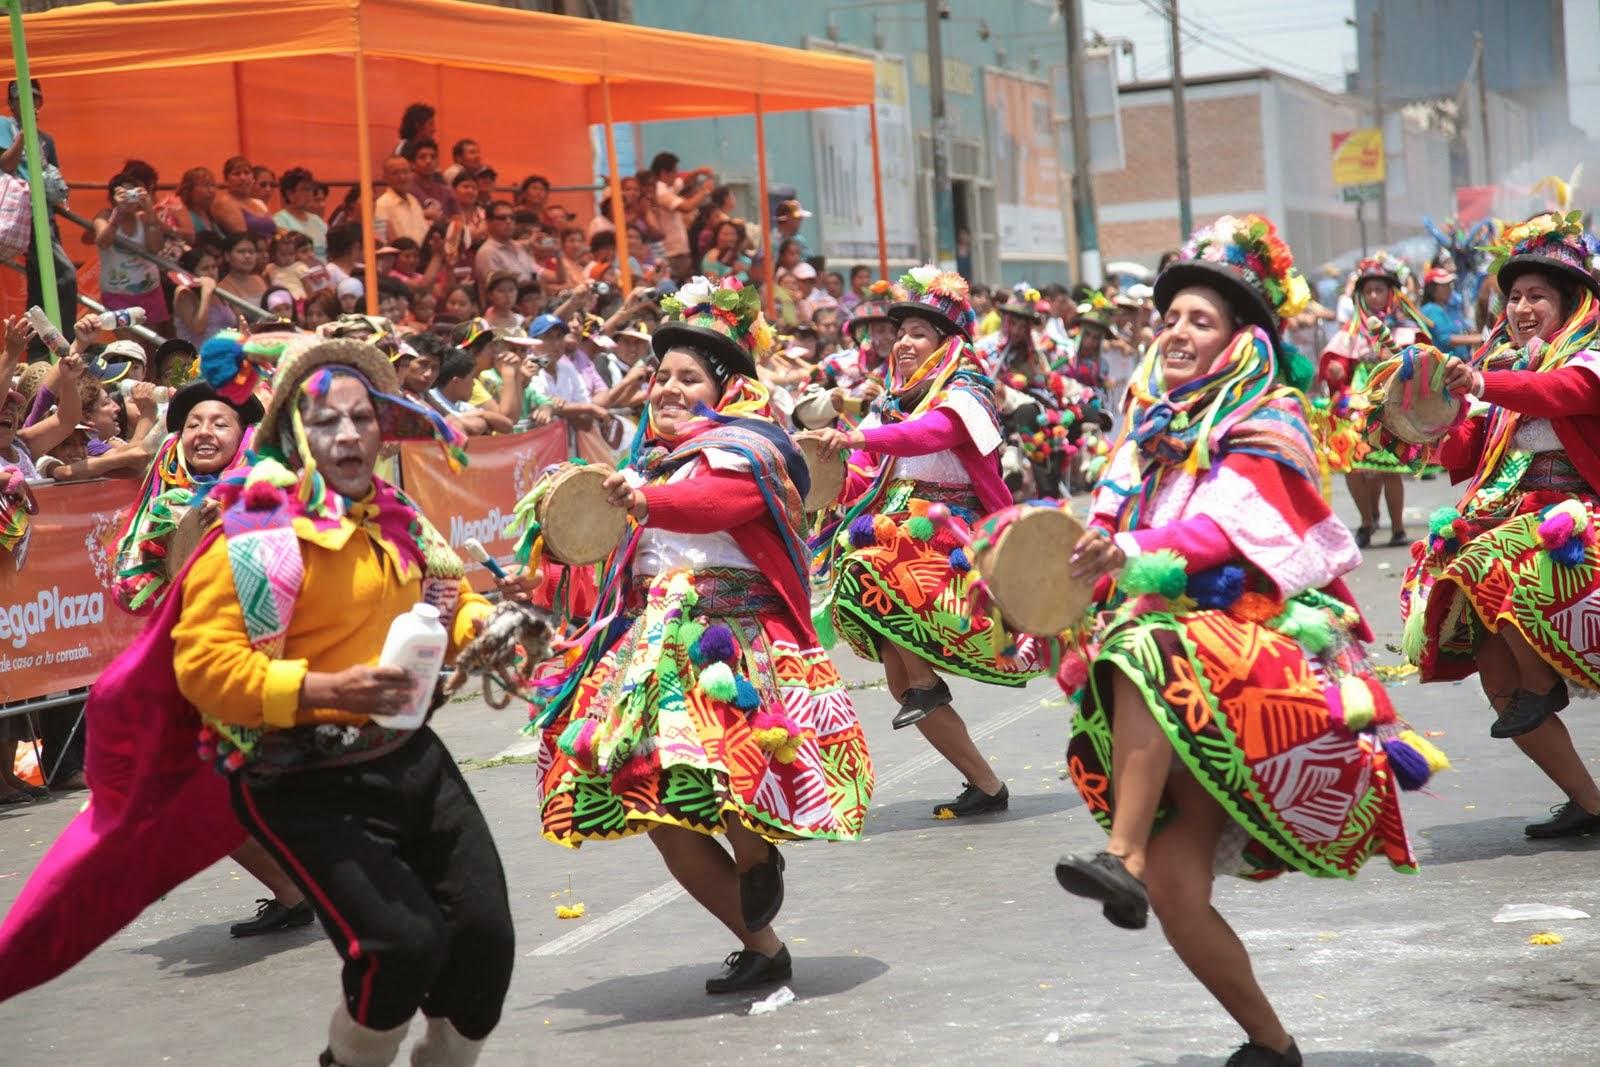 carnaval de chaca ayacucho curso taller de danzas folkloricas huanta